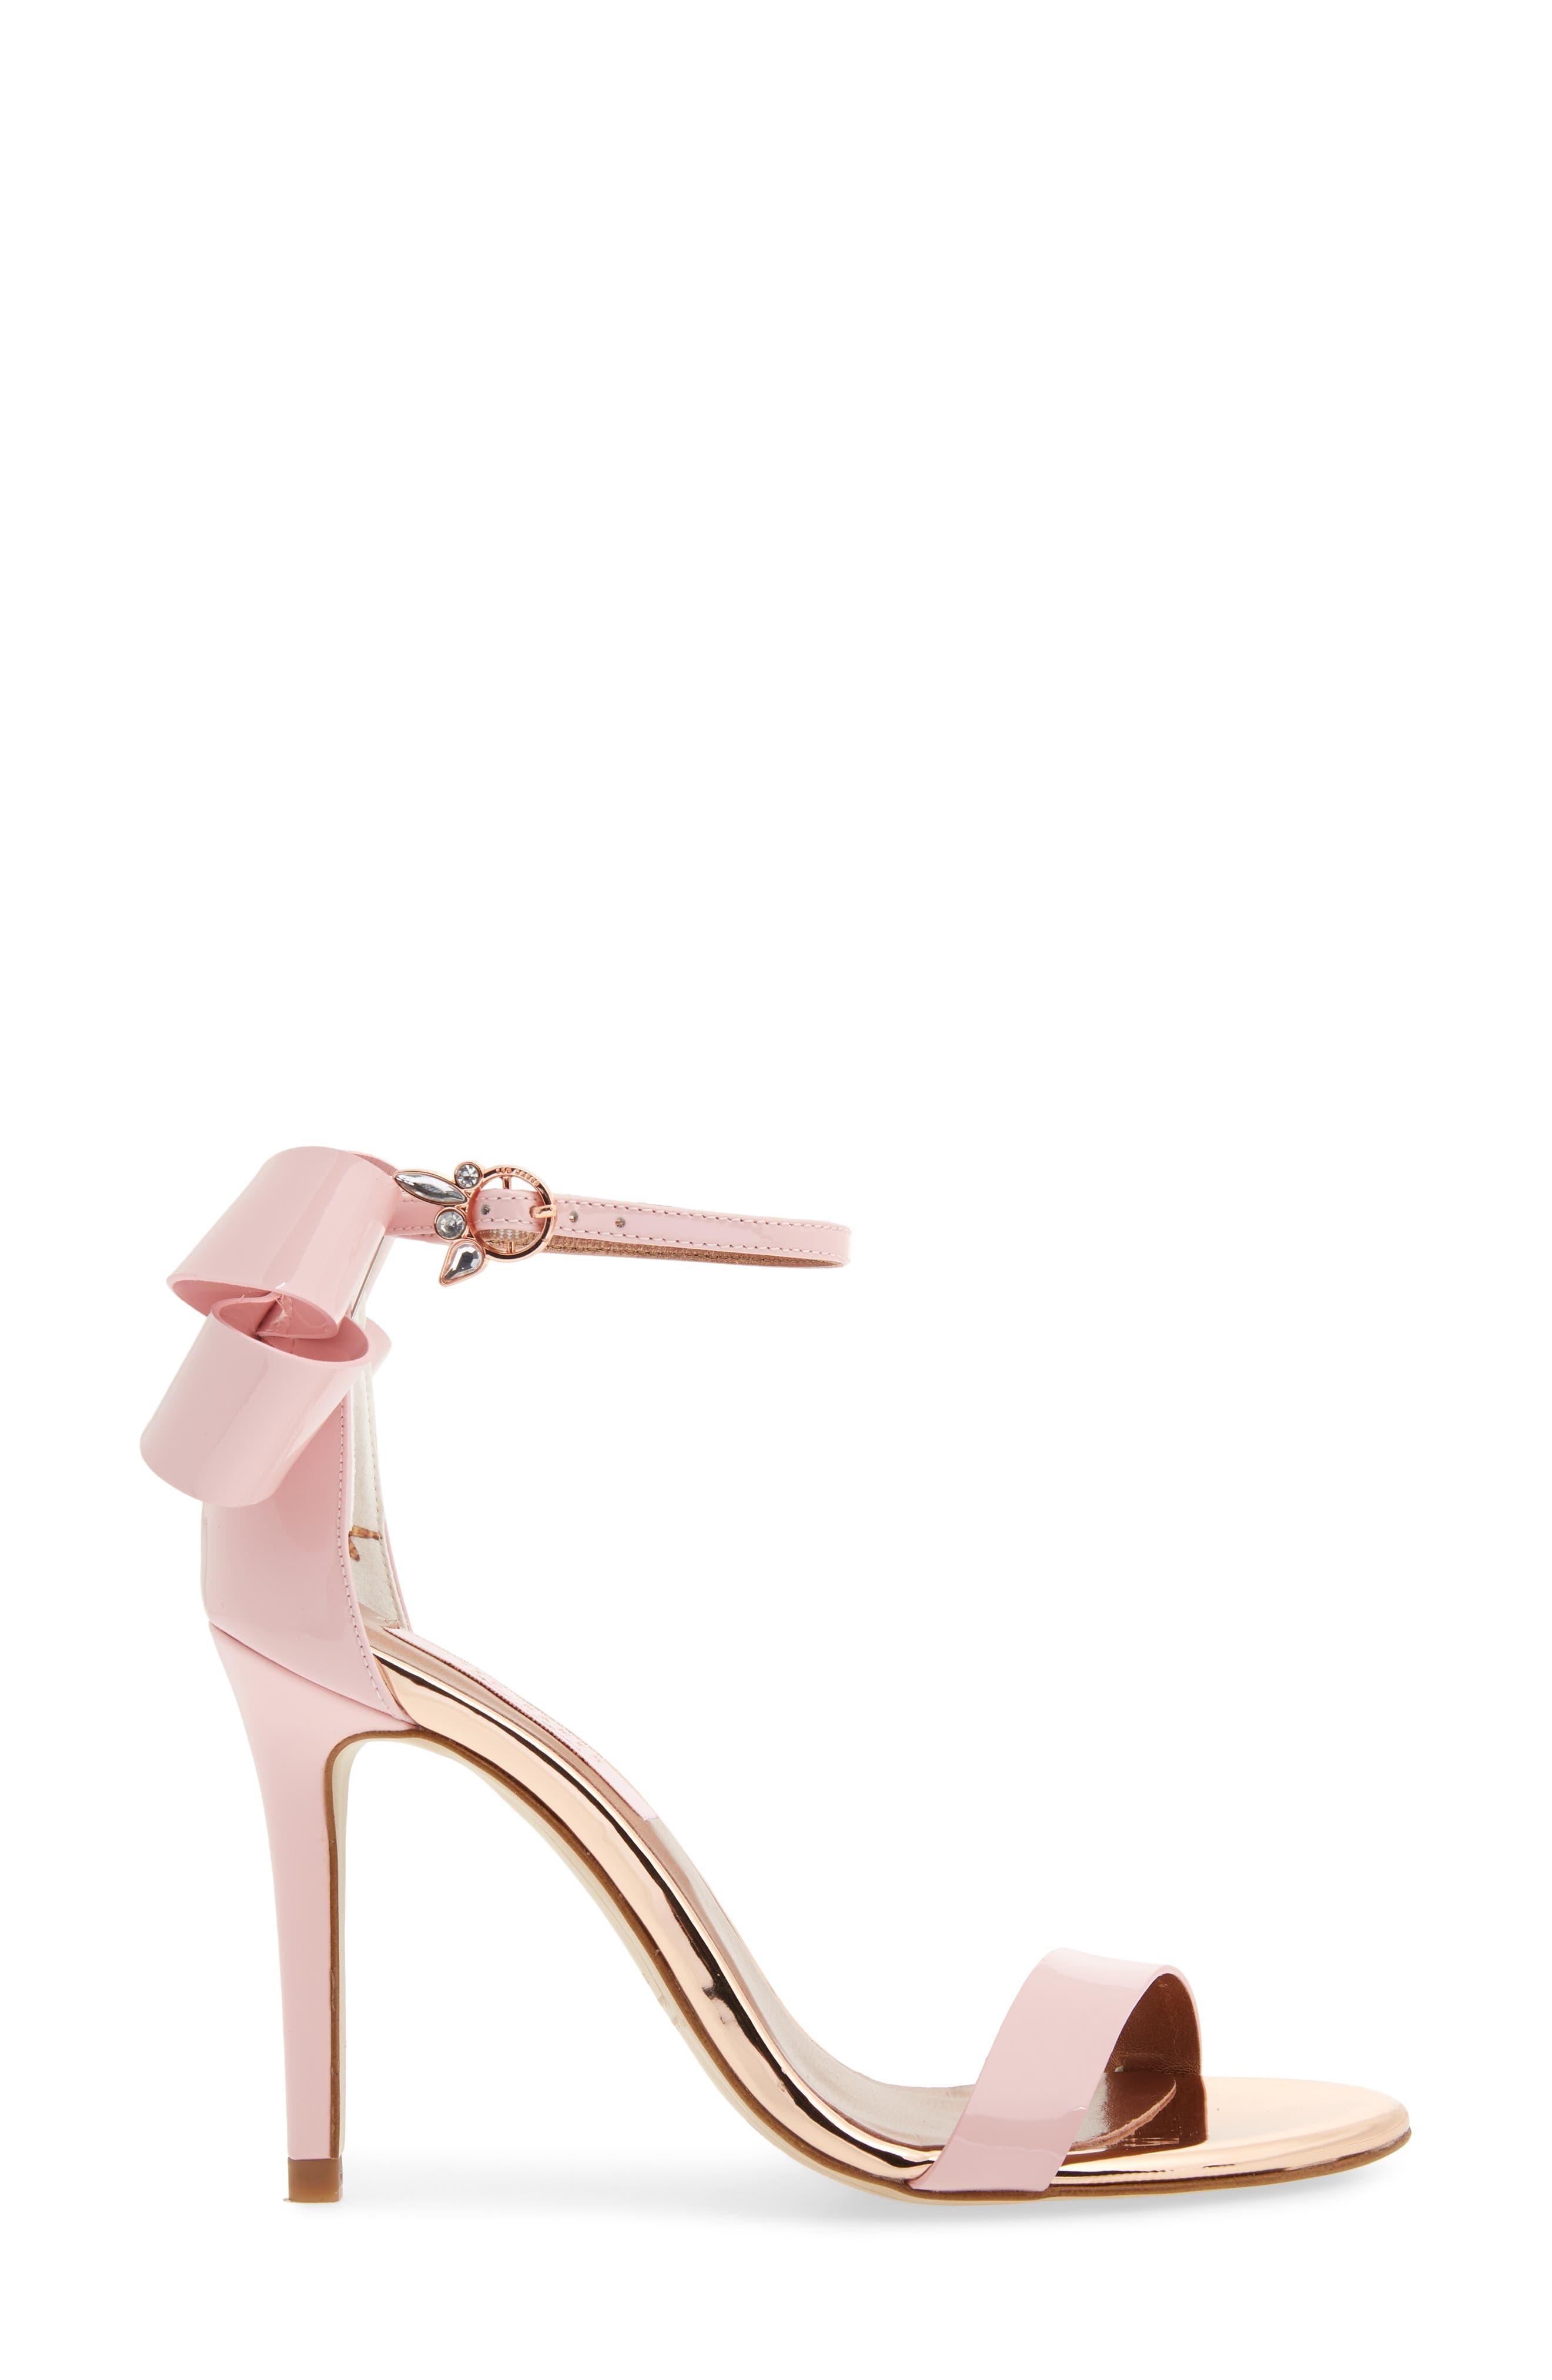 Sandalo Sandal,                             Alternate thumbnail 3, color,                             Light Pink Leather